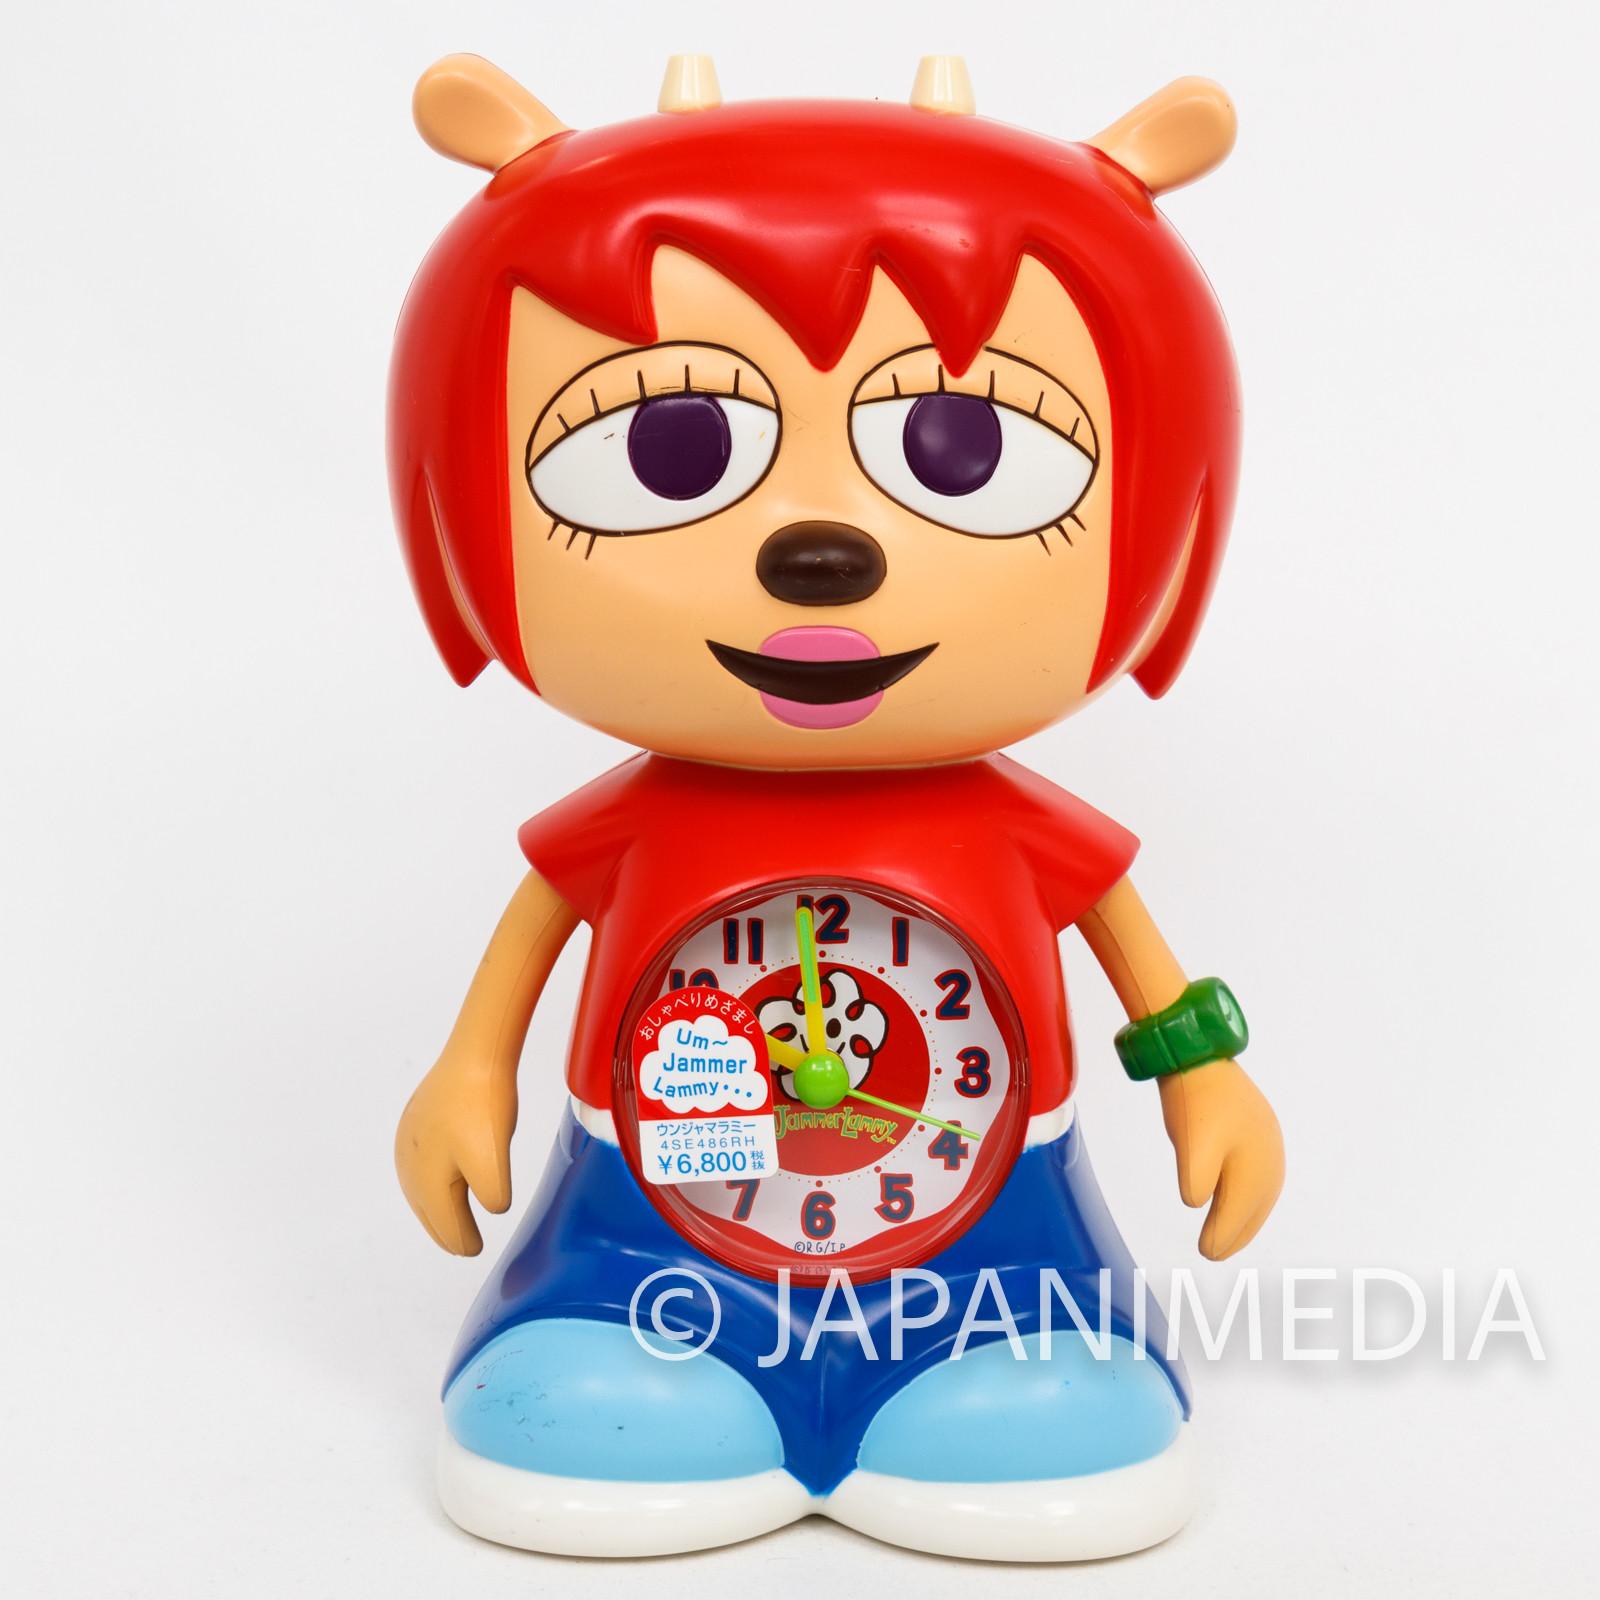 UmJammer Lammy Figure Type Alarm Clock JAPAN ANIME GAME PARAPPA RAPPER